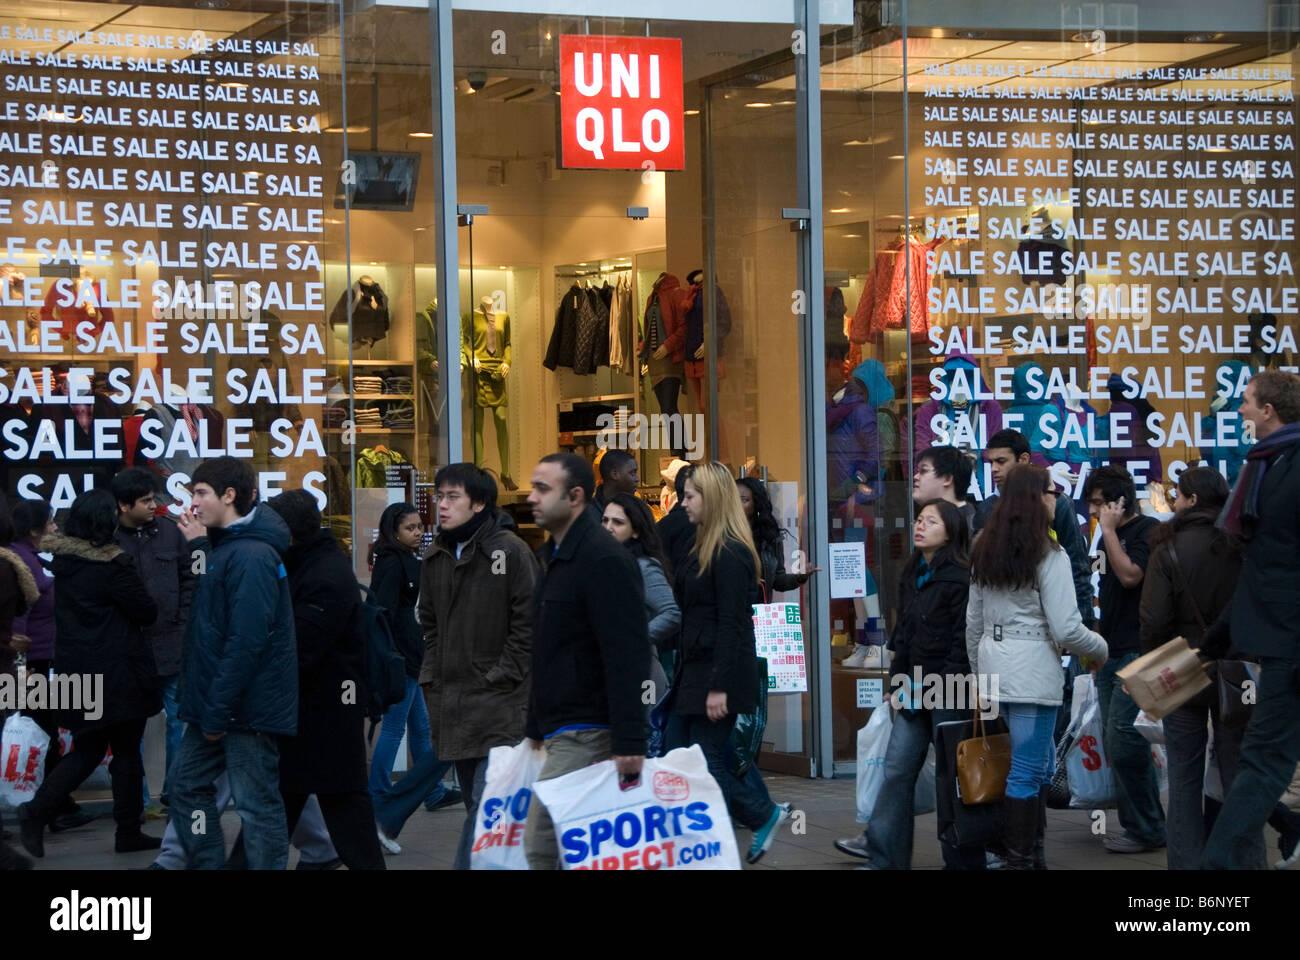 people outside uniqlo